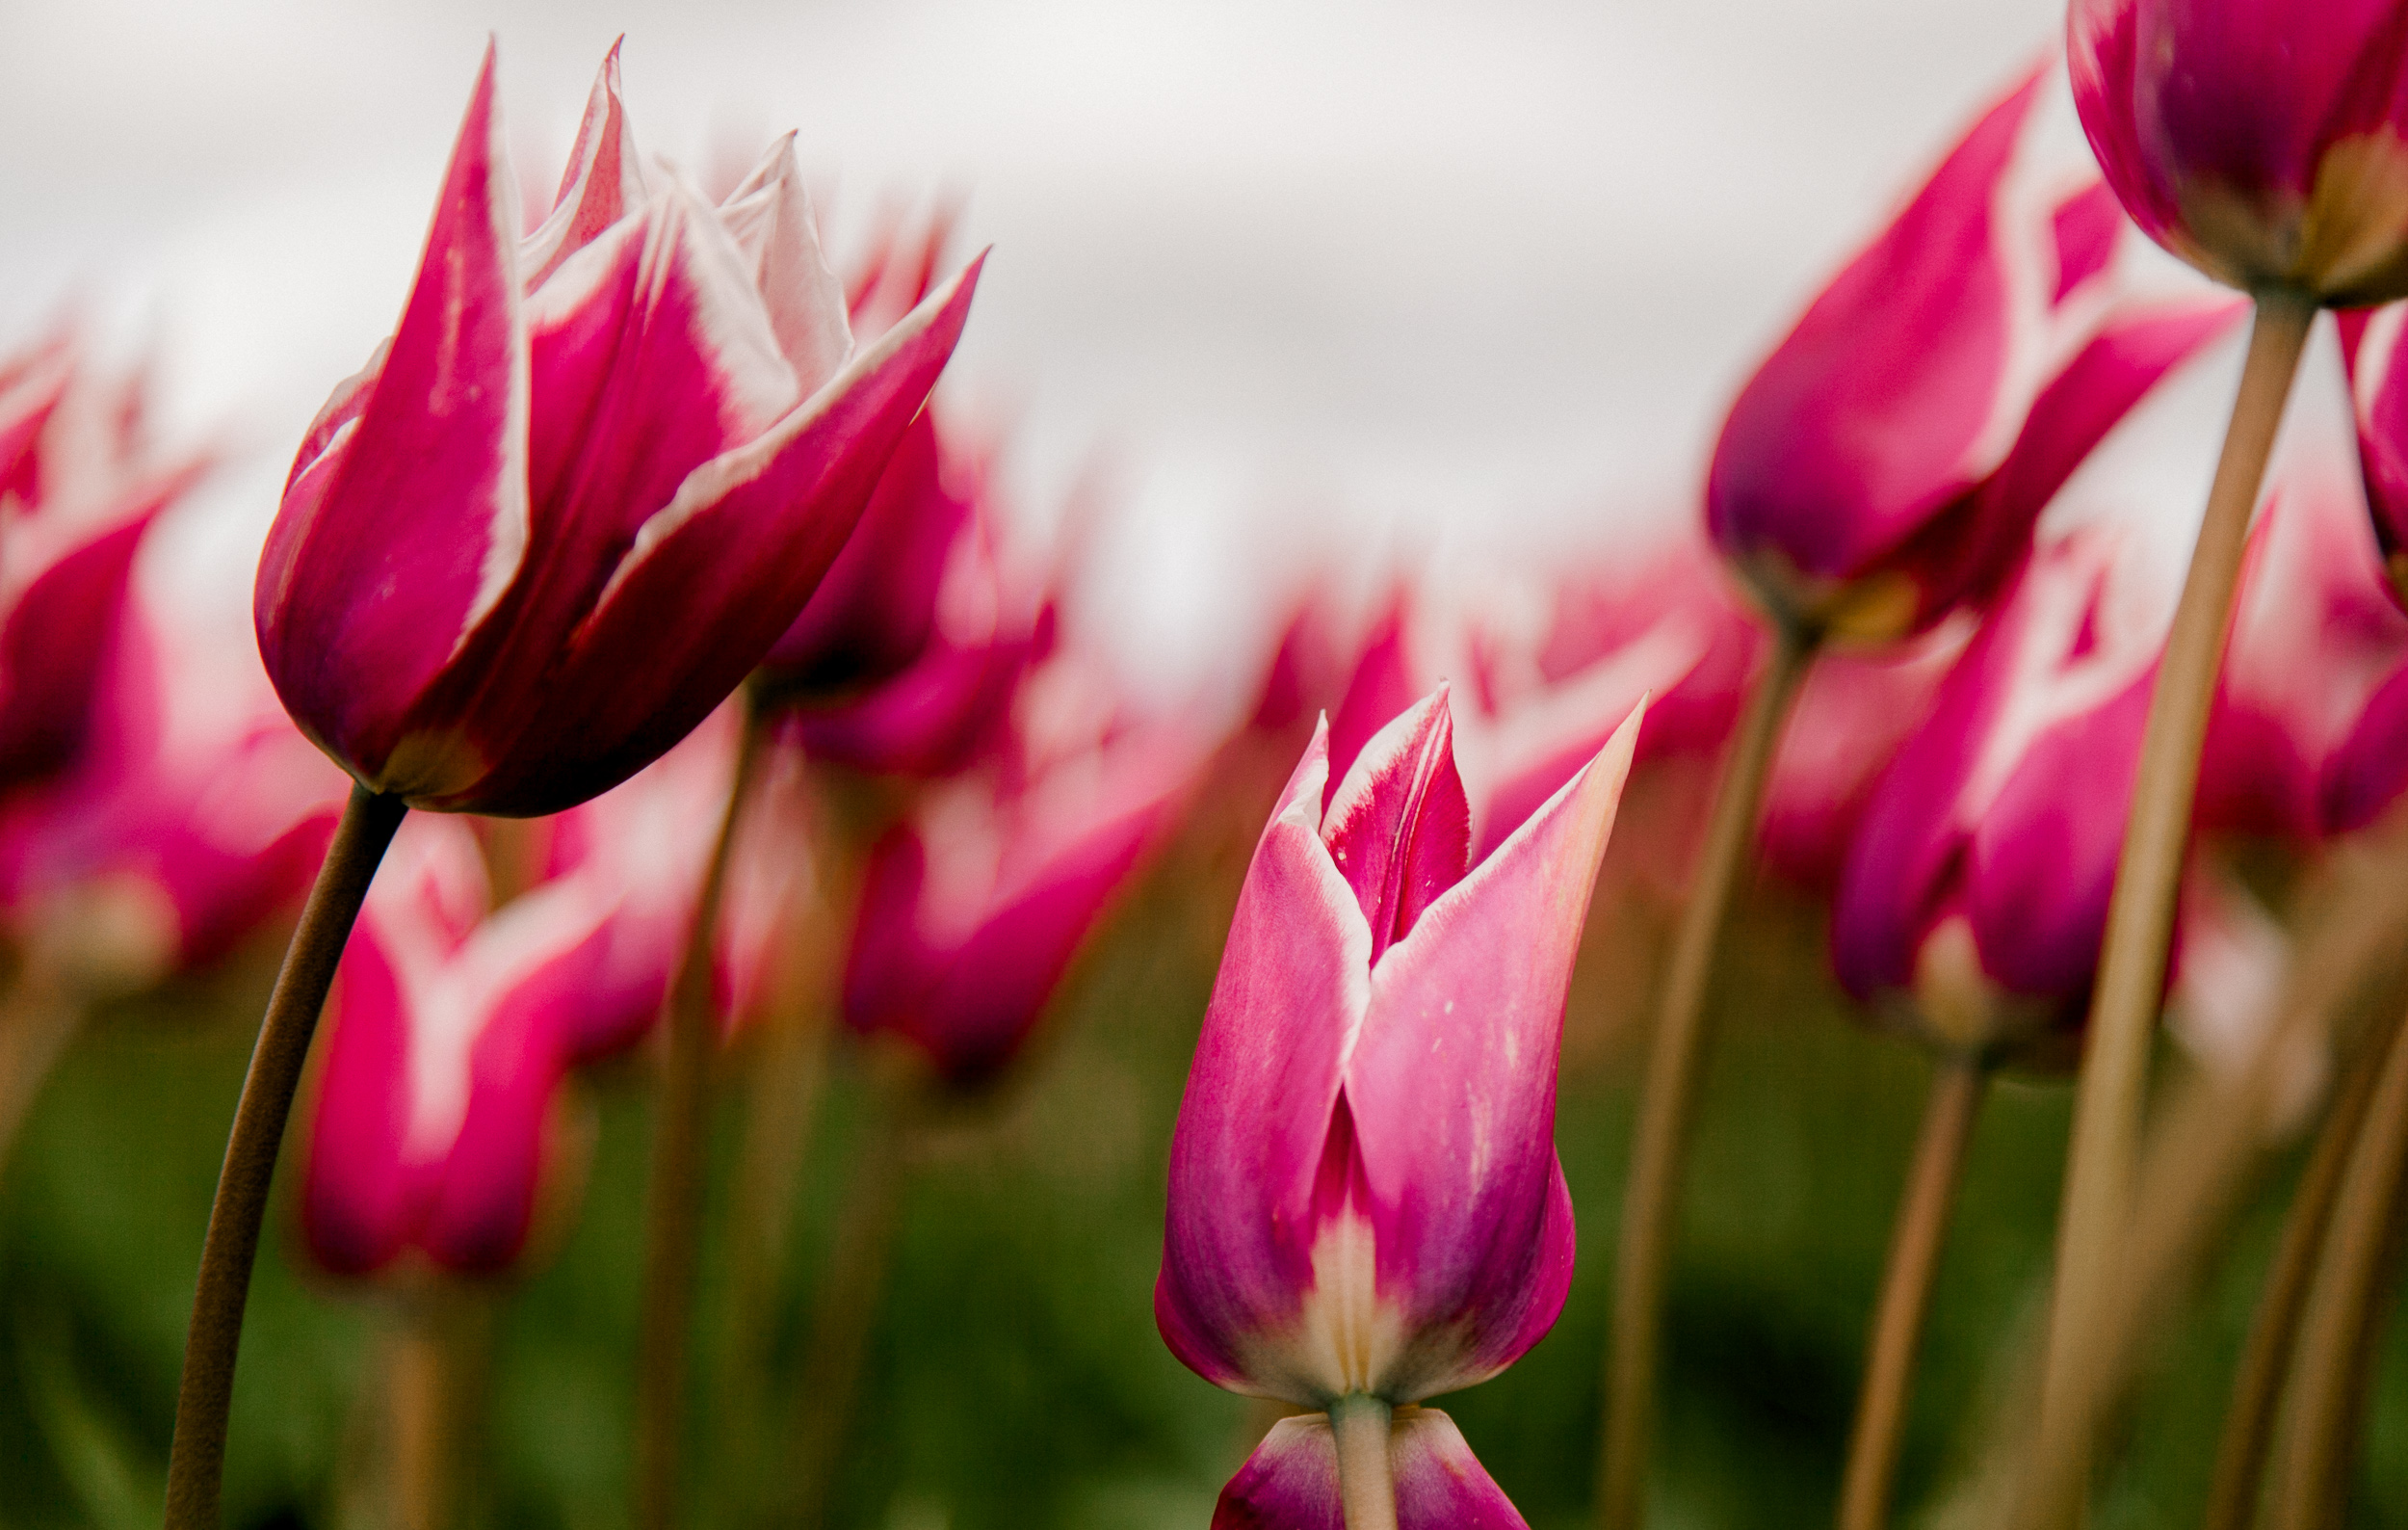 tulips-skagit-wa-abbey-taylor-6.jpg